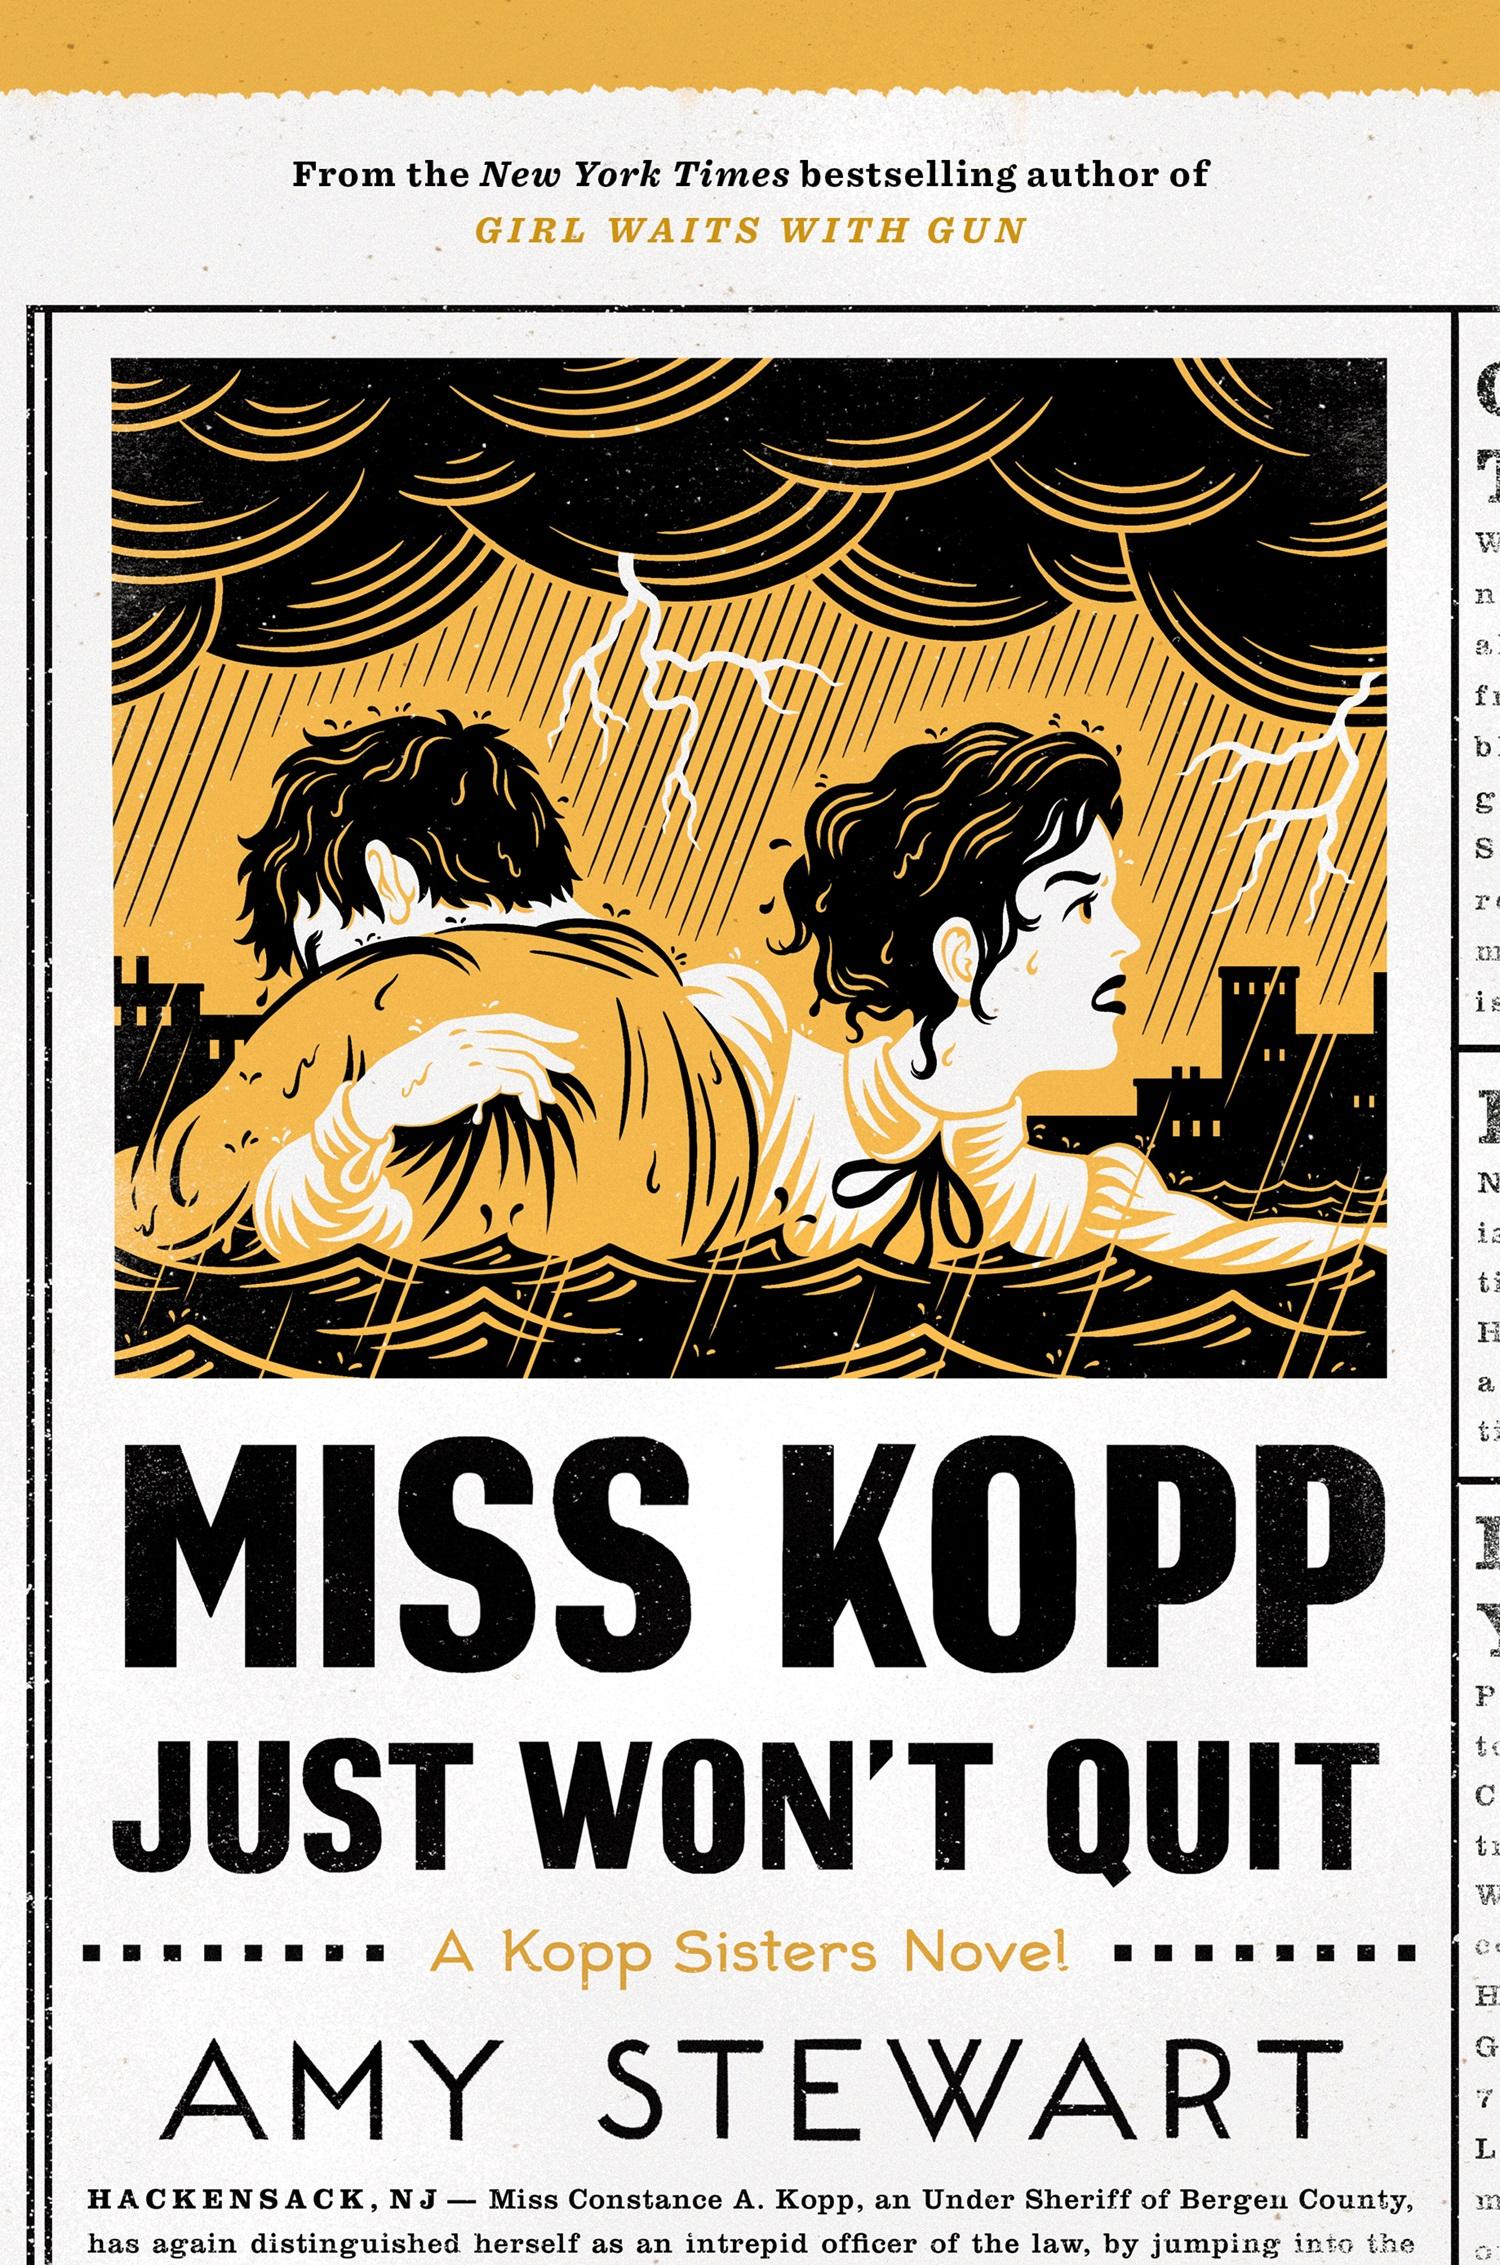 Miss-Kopp-Just-Wont-Quit.jpg